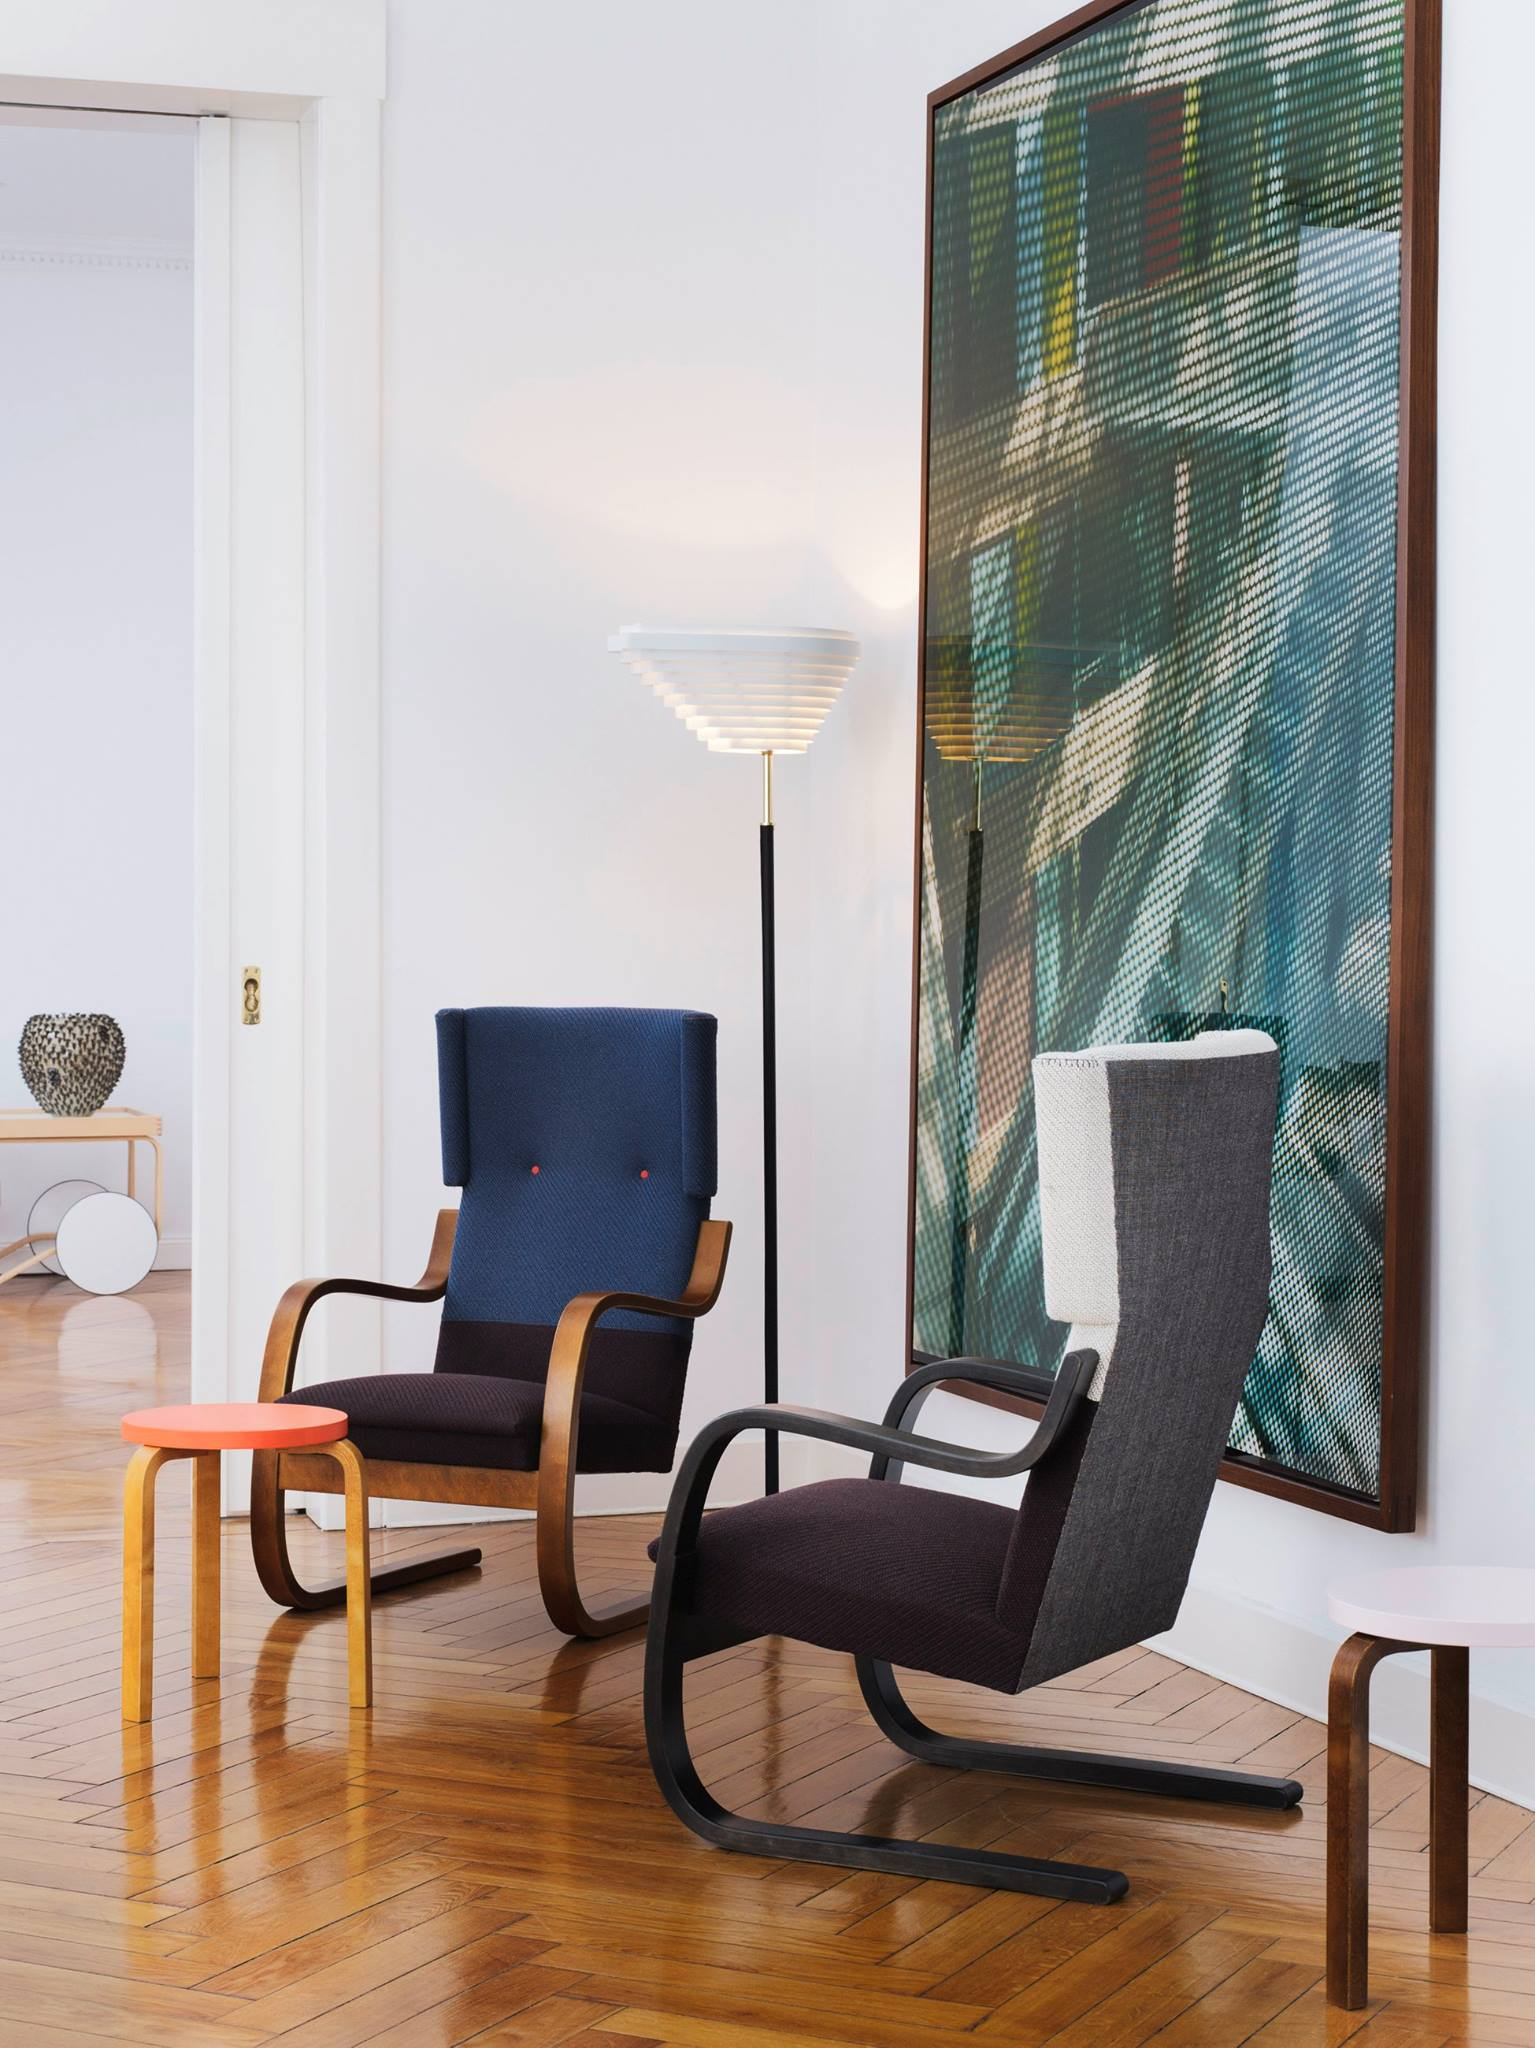 Armchair and 401 by Hella Jongerius from Artek